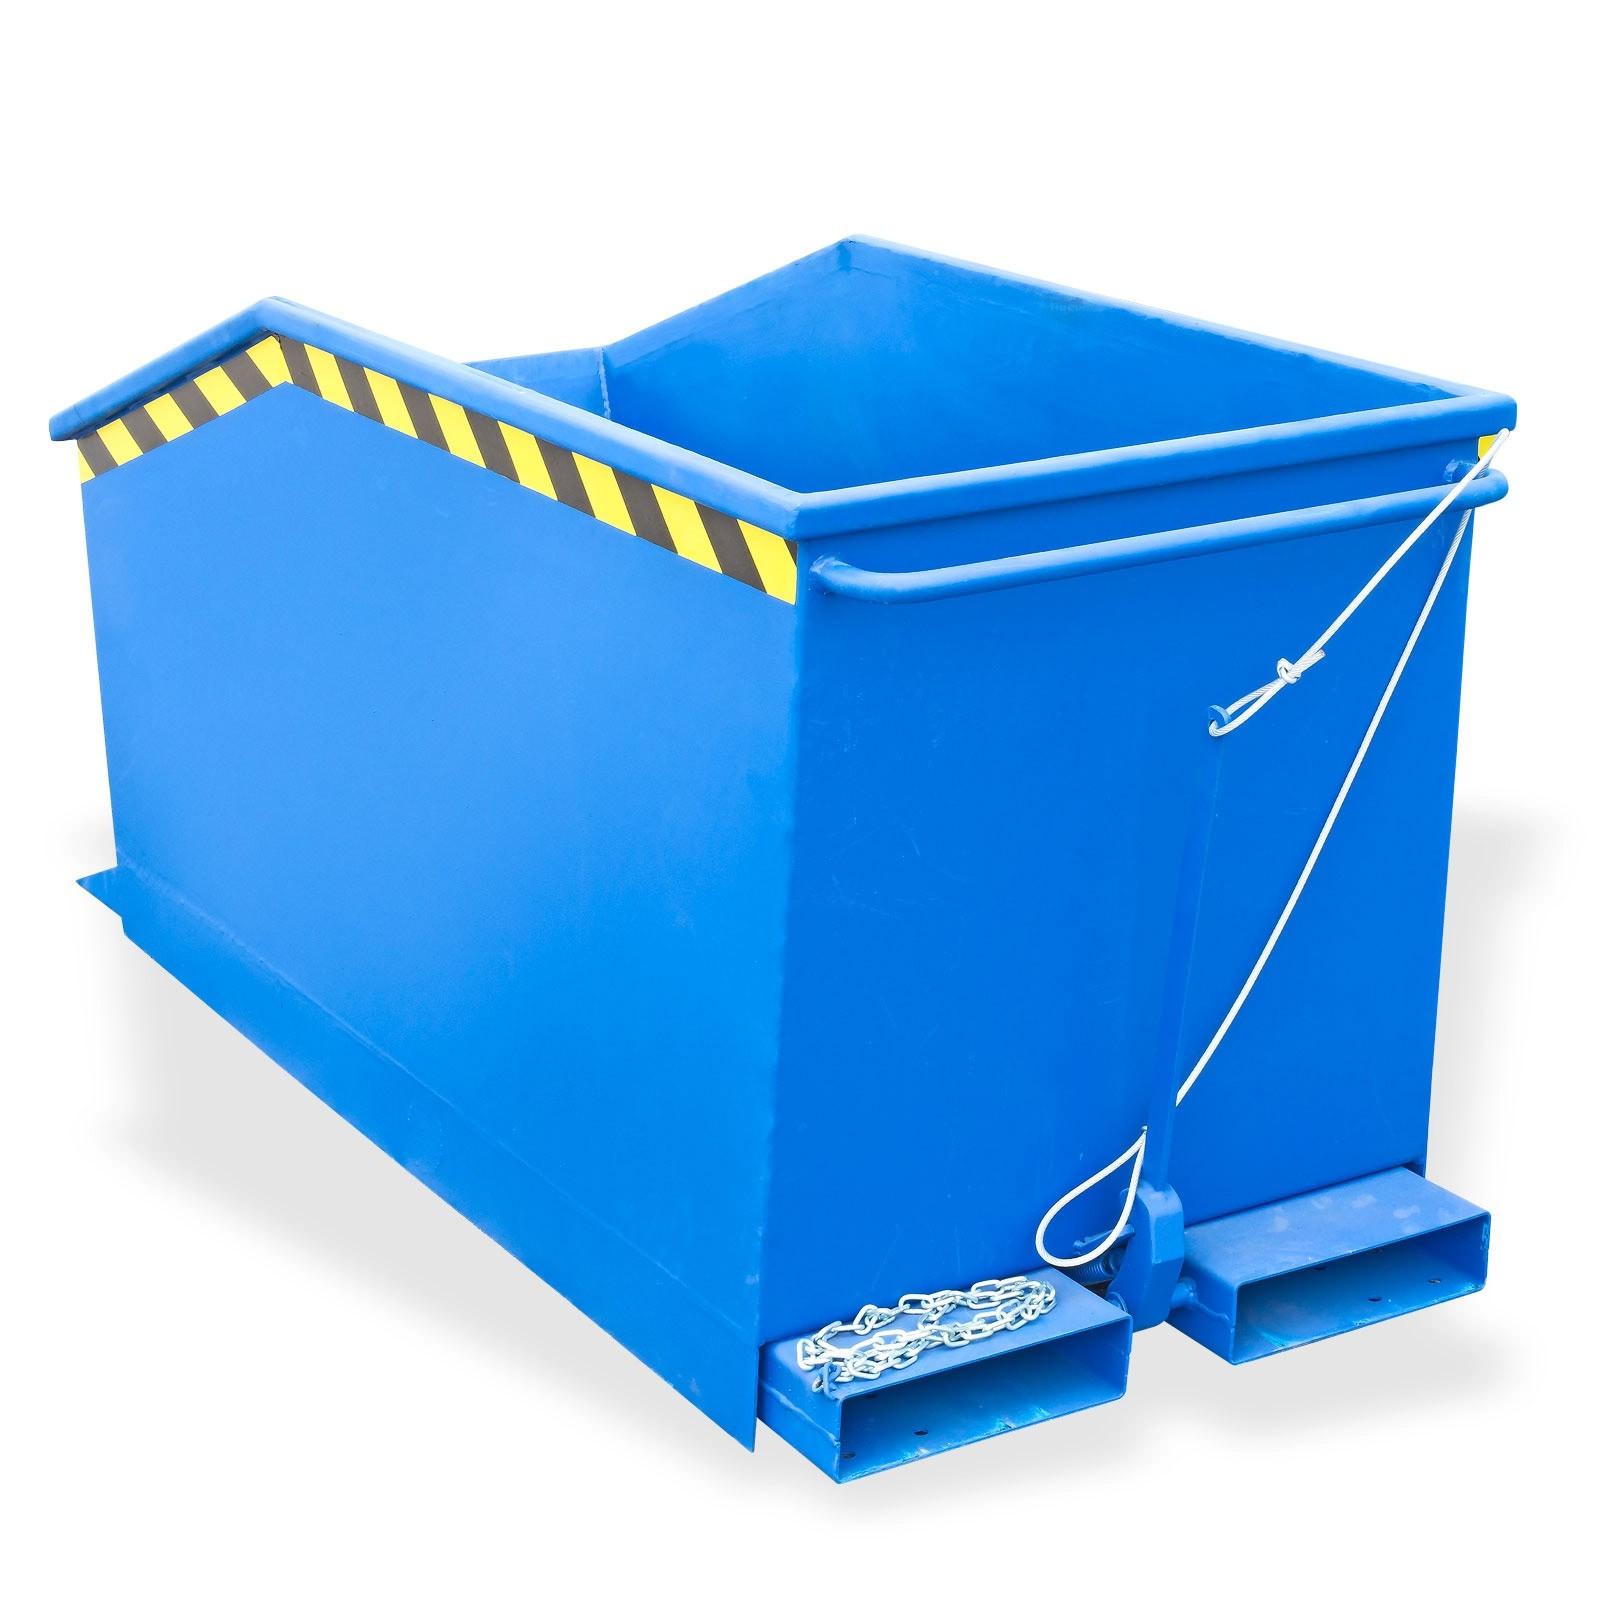 kippcontainer staplerkippmulde blau 500 liter 166x62x74 cm. Black Bedroom Furniture Sets. Home Design Ideas